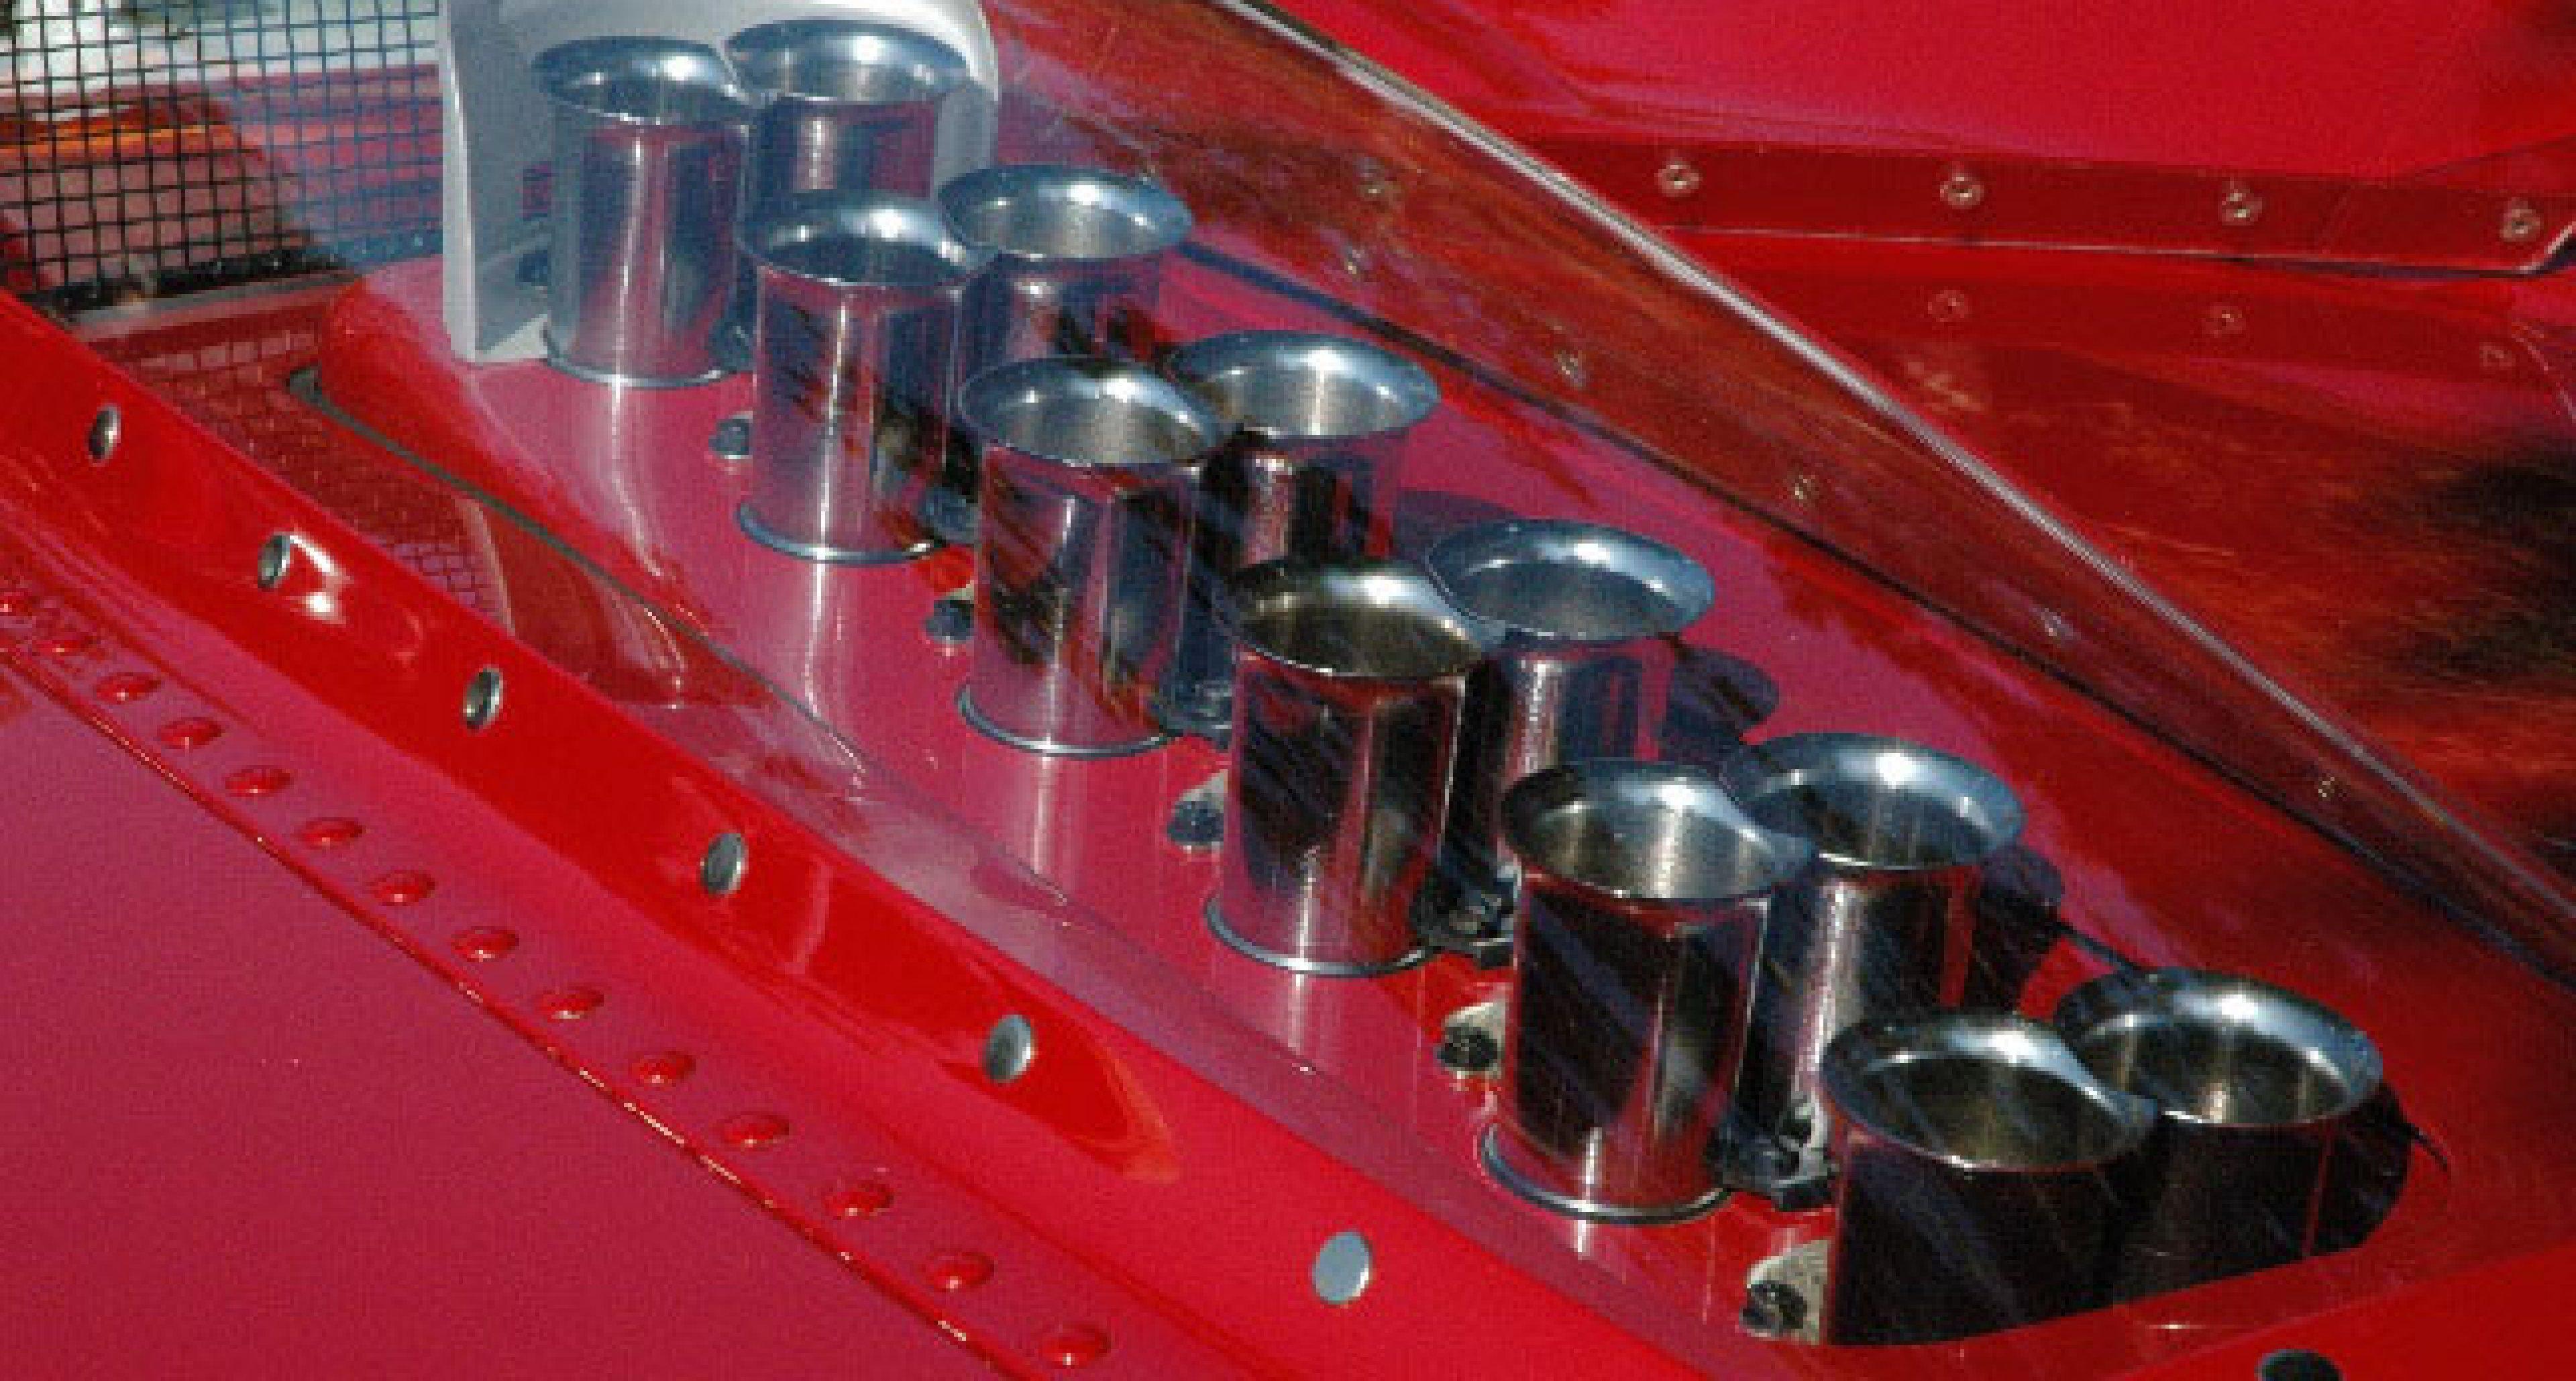 Pasadena Art Center: Legenden des Automobildesigns